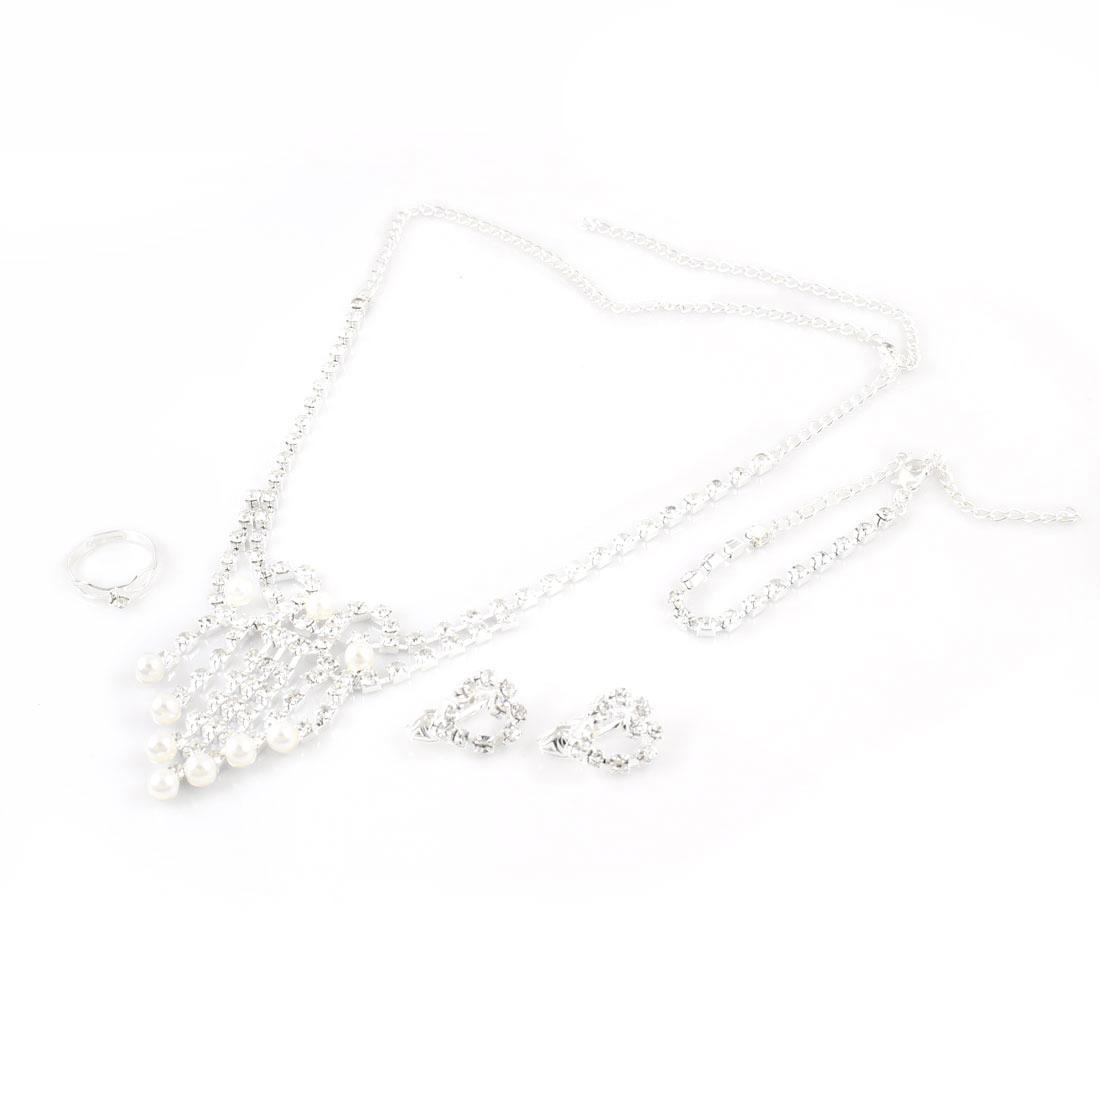 Lady Rhinestones Beads Dangling Necklace Clip on Earrings Jewelry 4 in 1